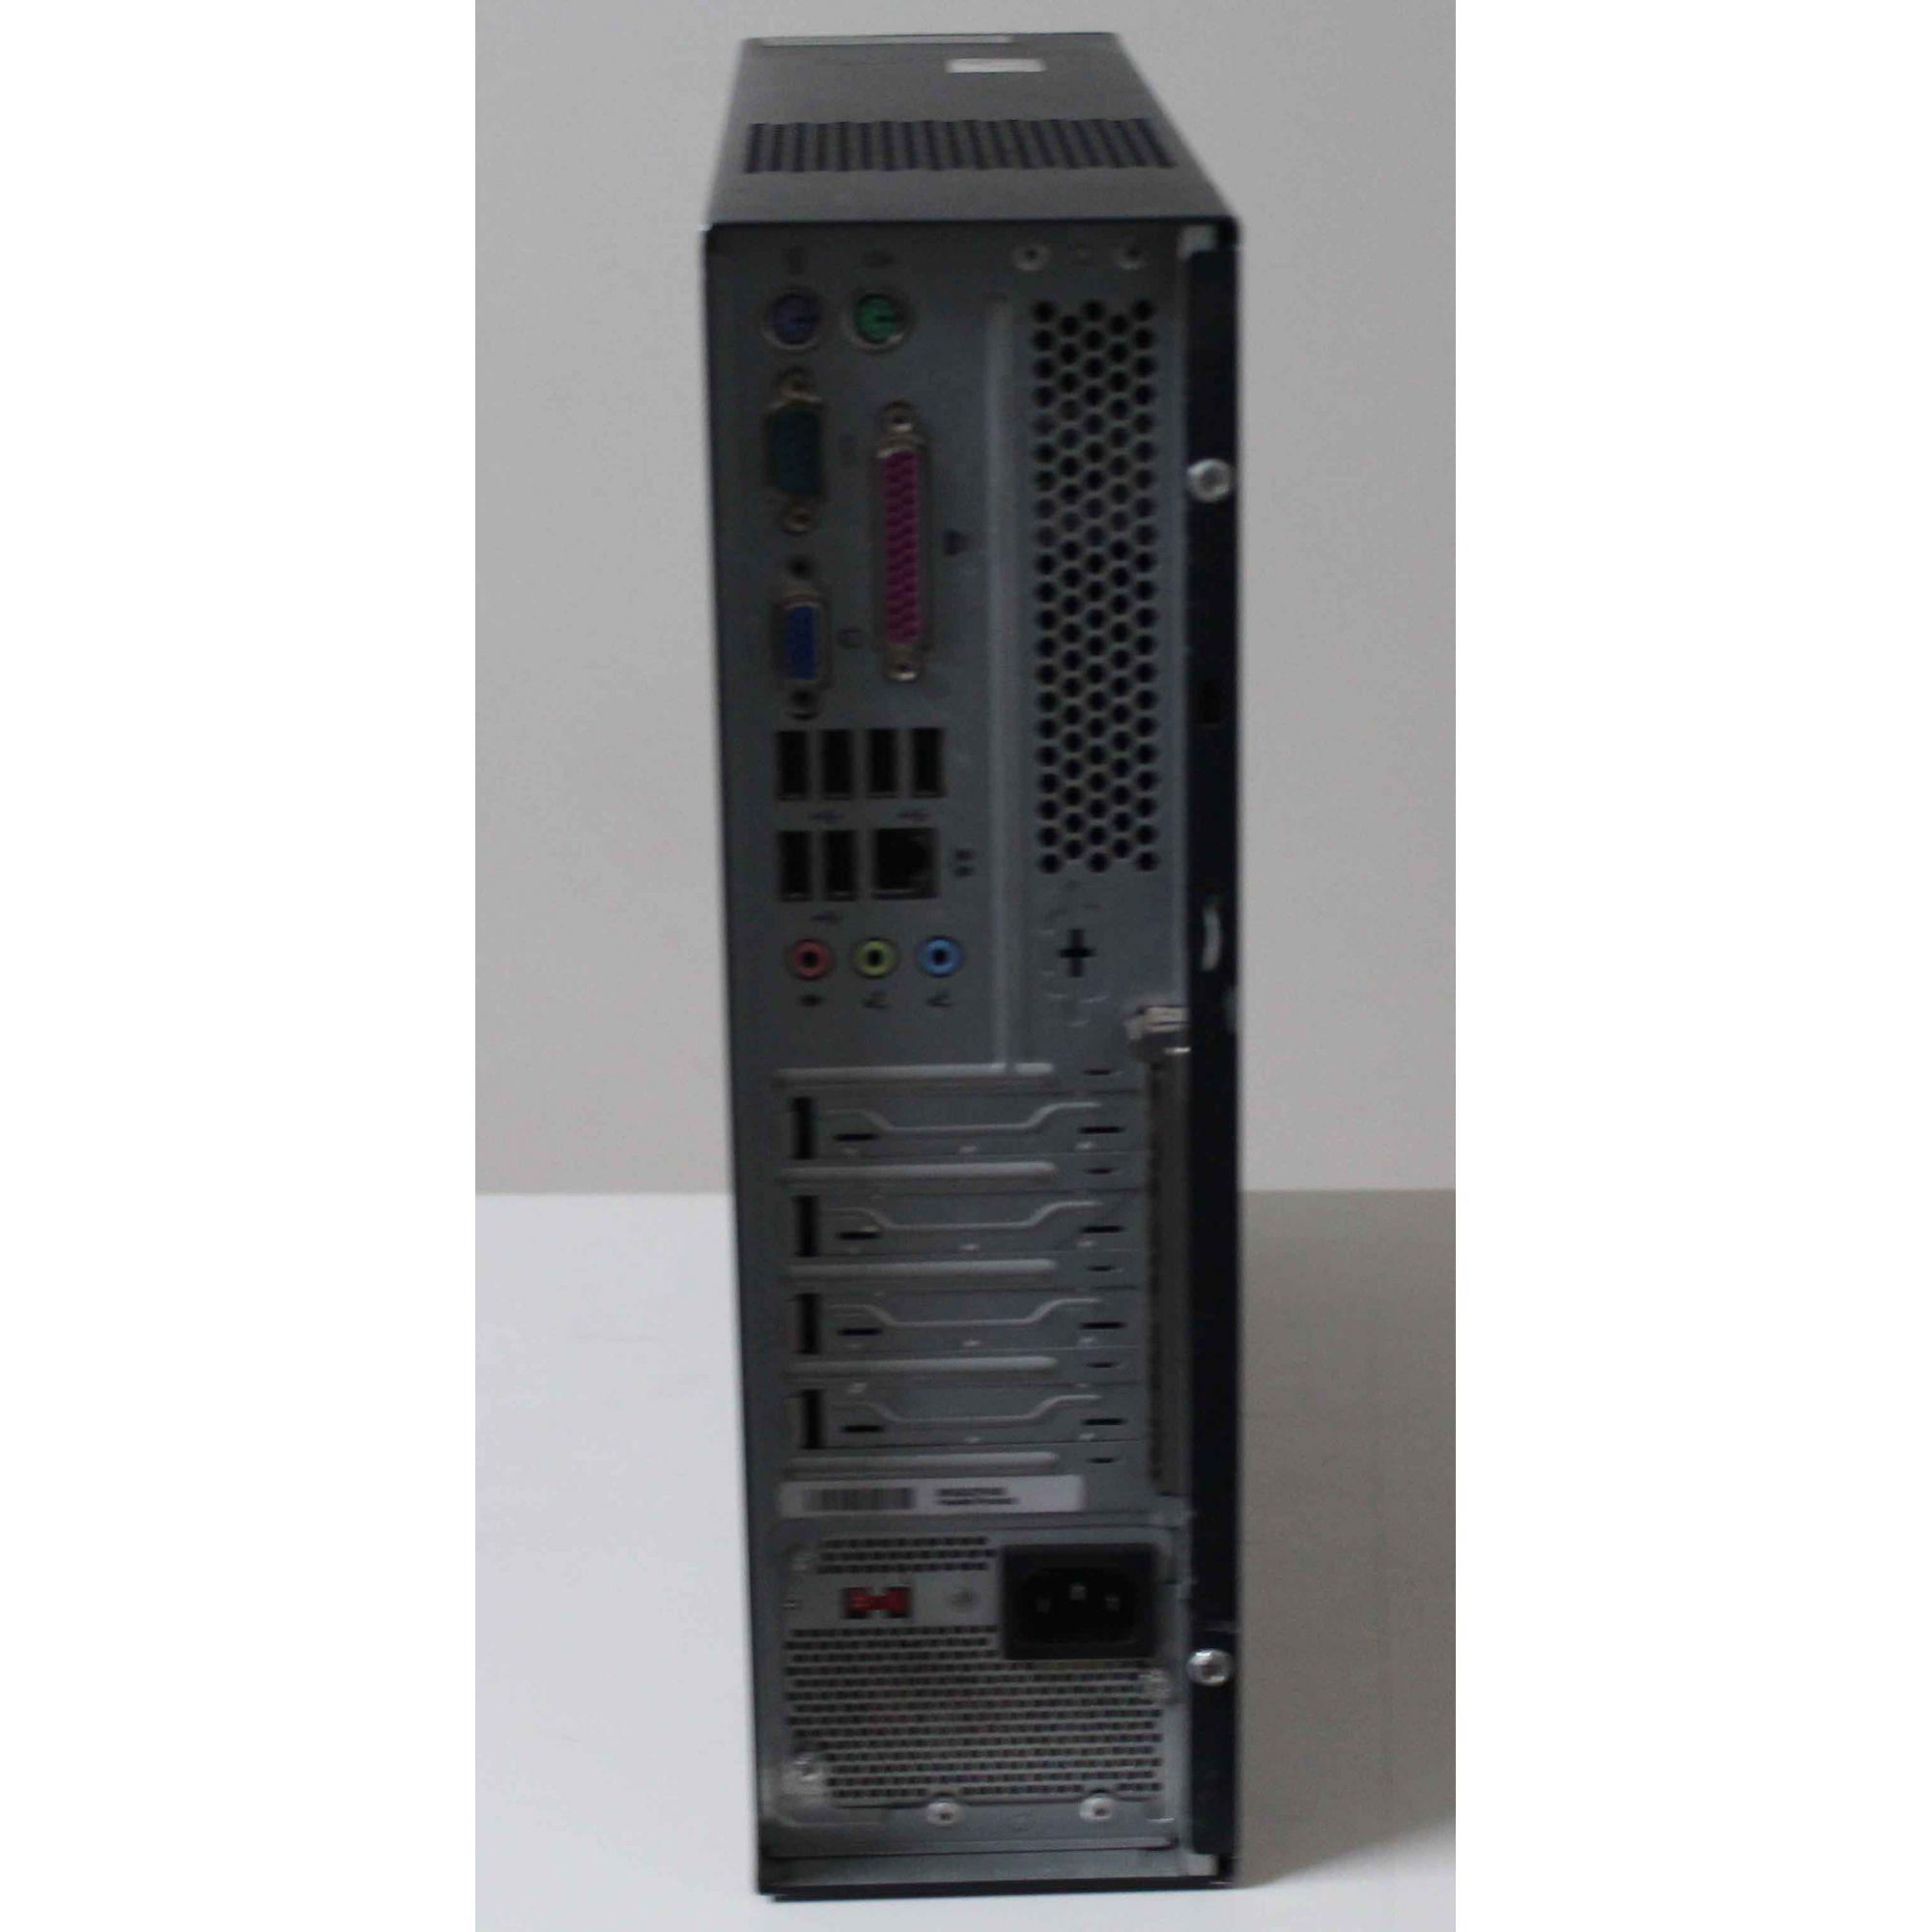 Computador HP Compaq DX 7400 Core 2 Duo 2.2GHz 3GB HD-80GB